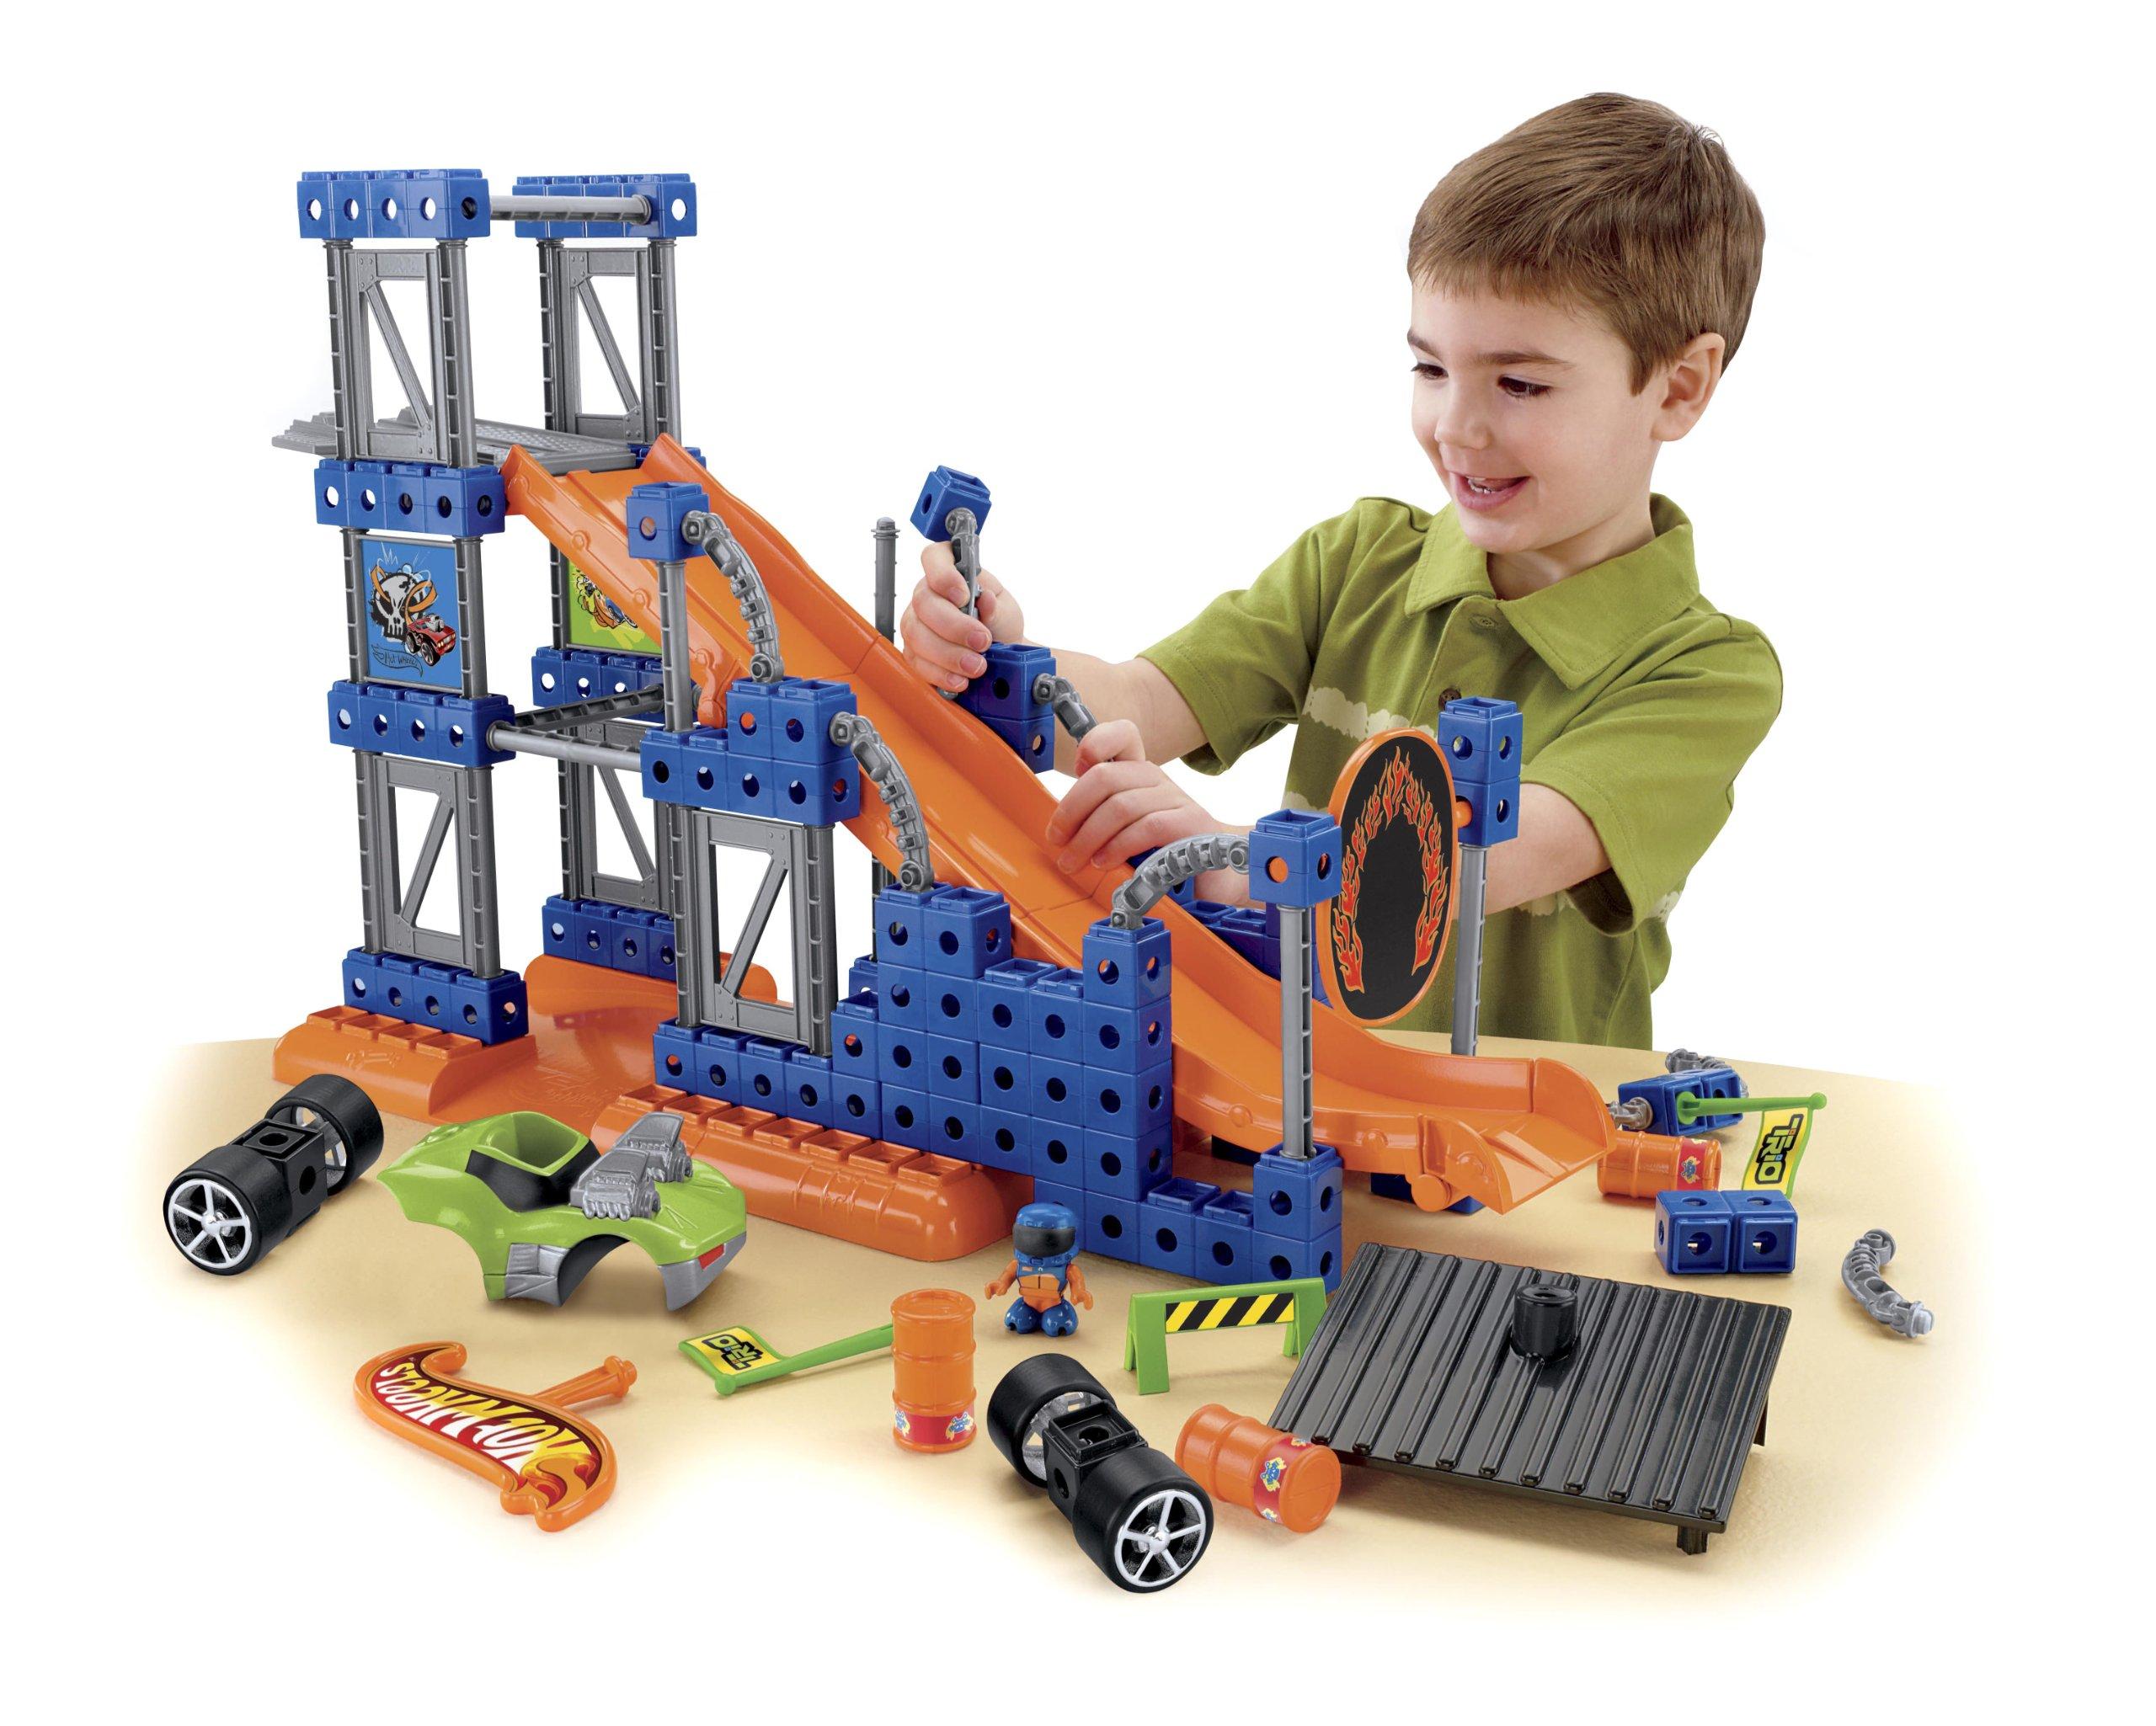 Fisher-Price TRIO Hot Wheels Stunt Ramp Builder